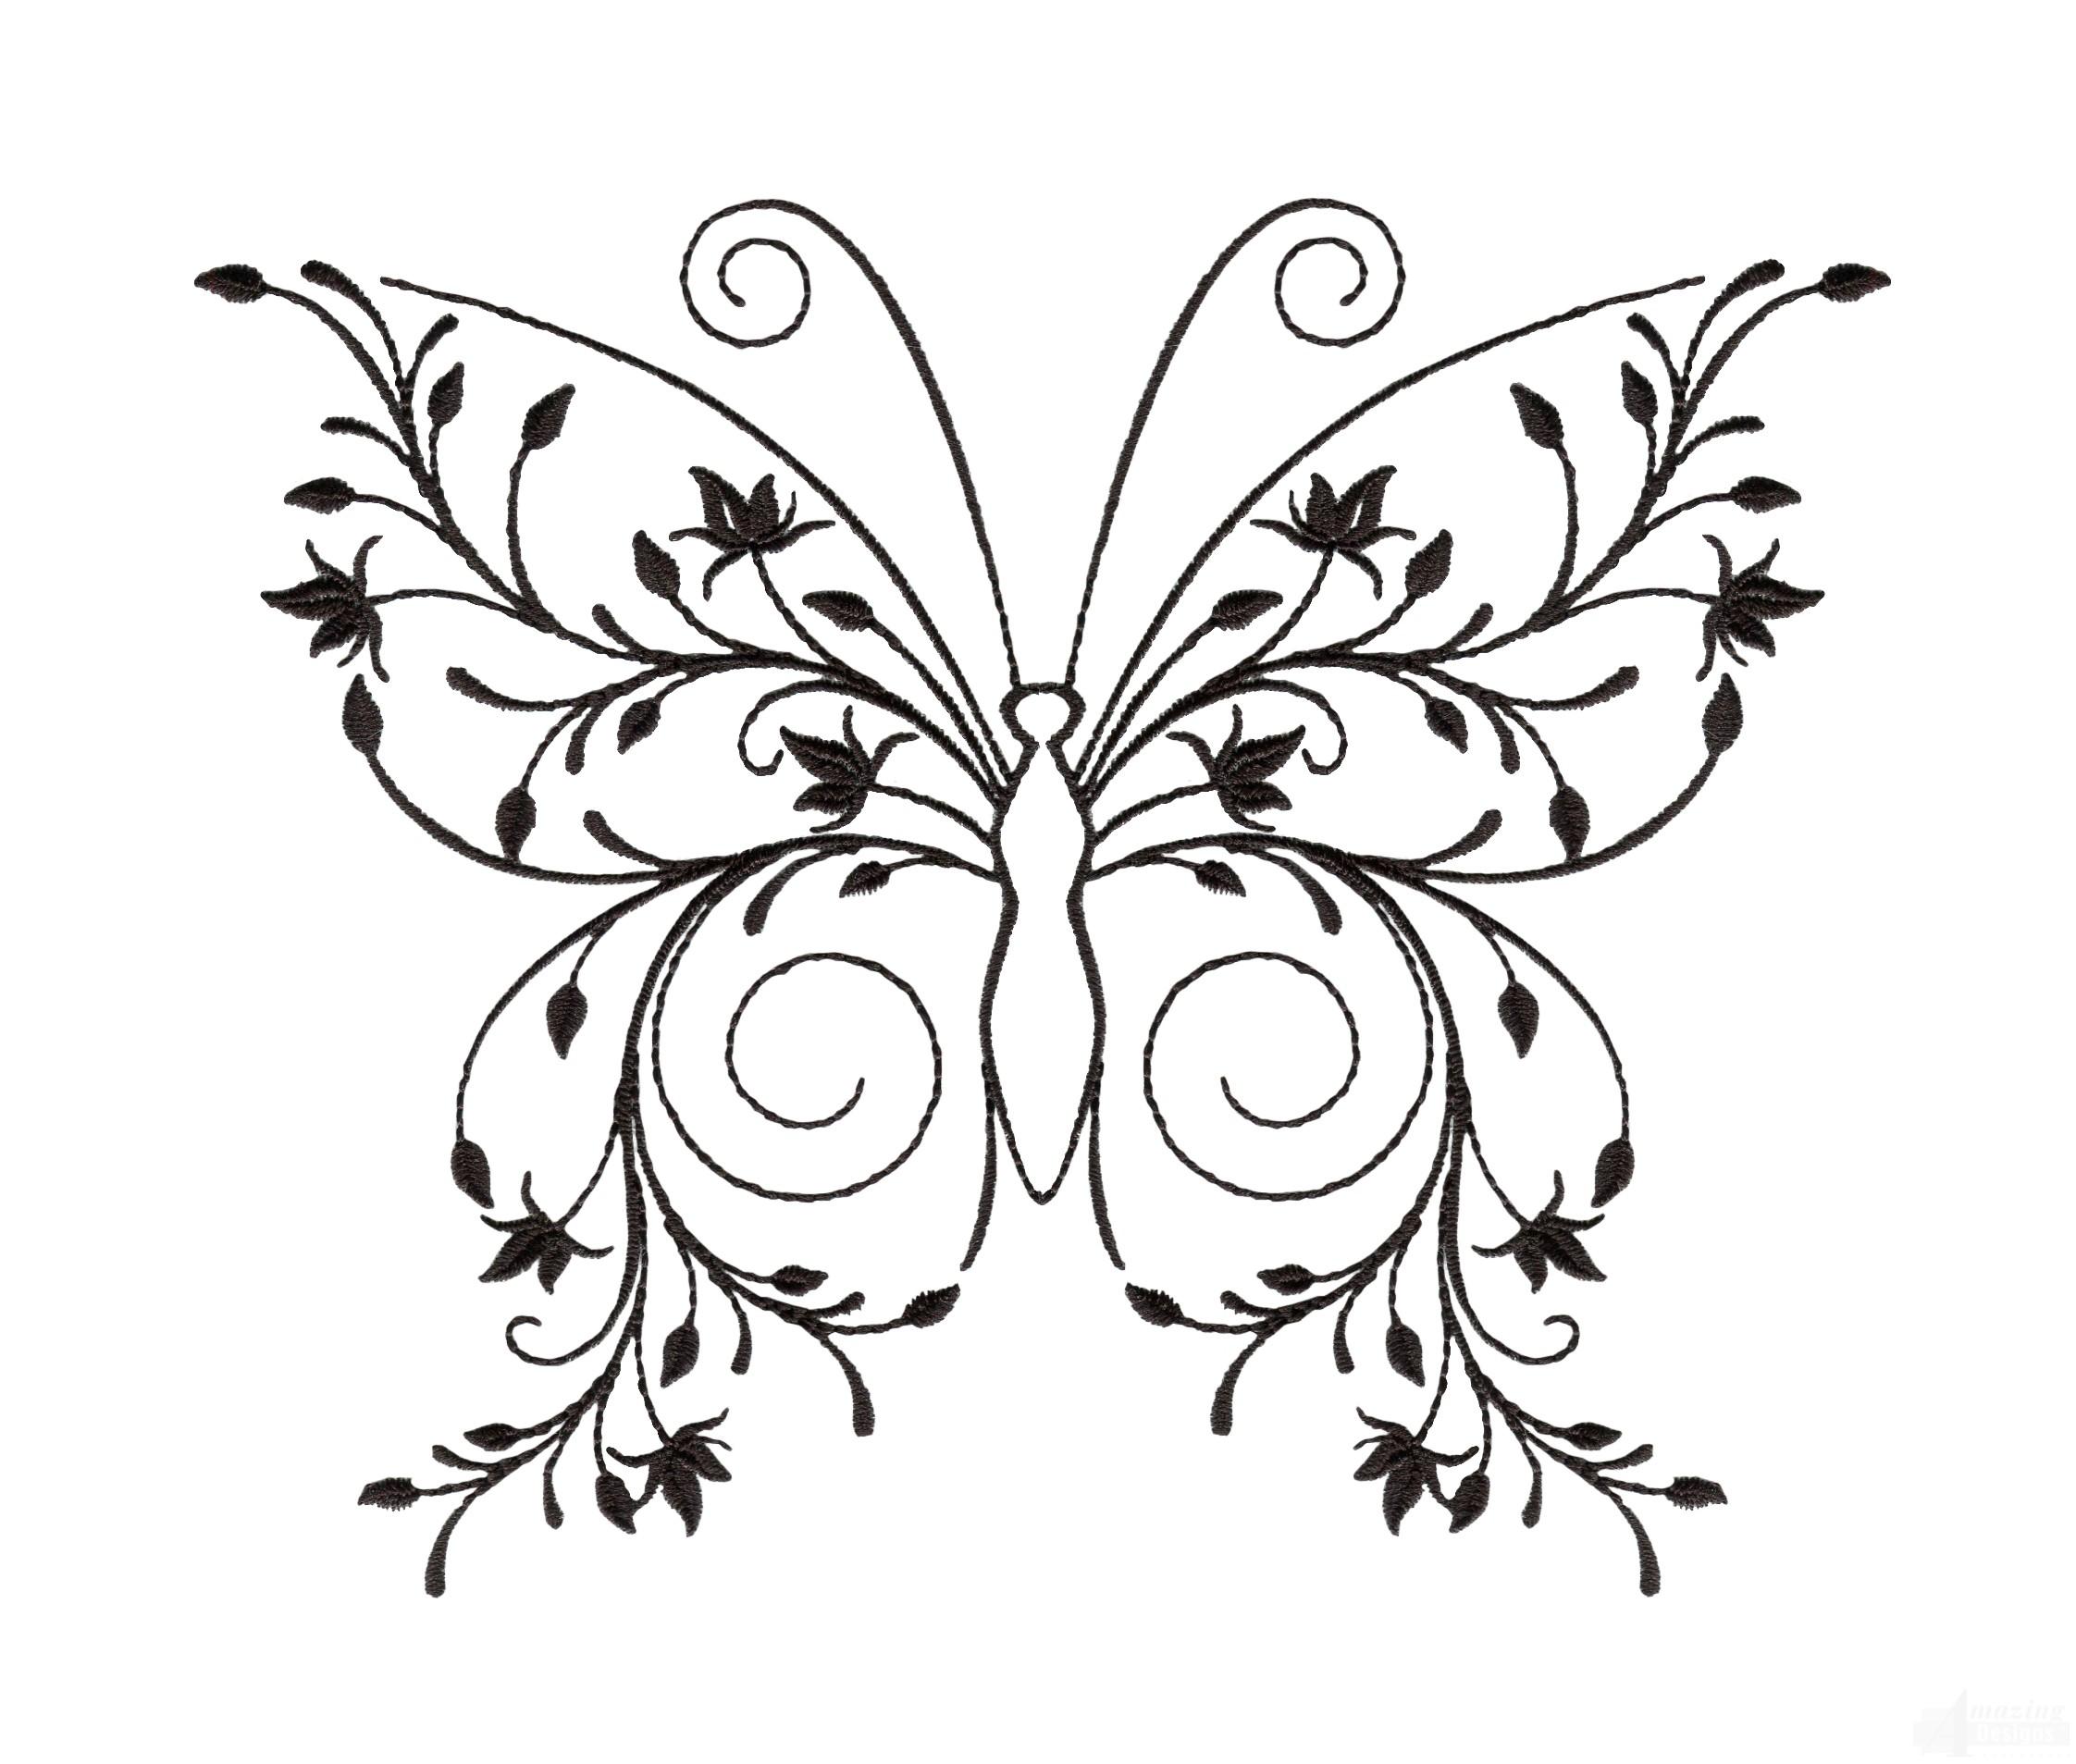 2244x1907 Butterfly Zen Garden Sketch Embroidery Design